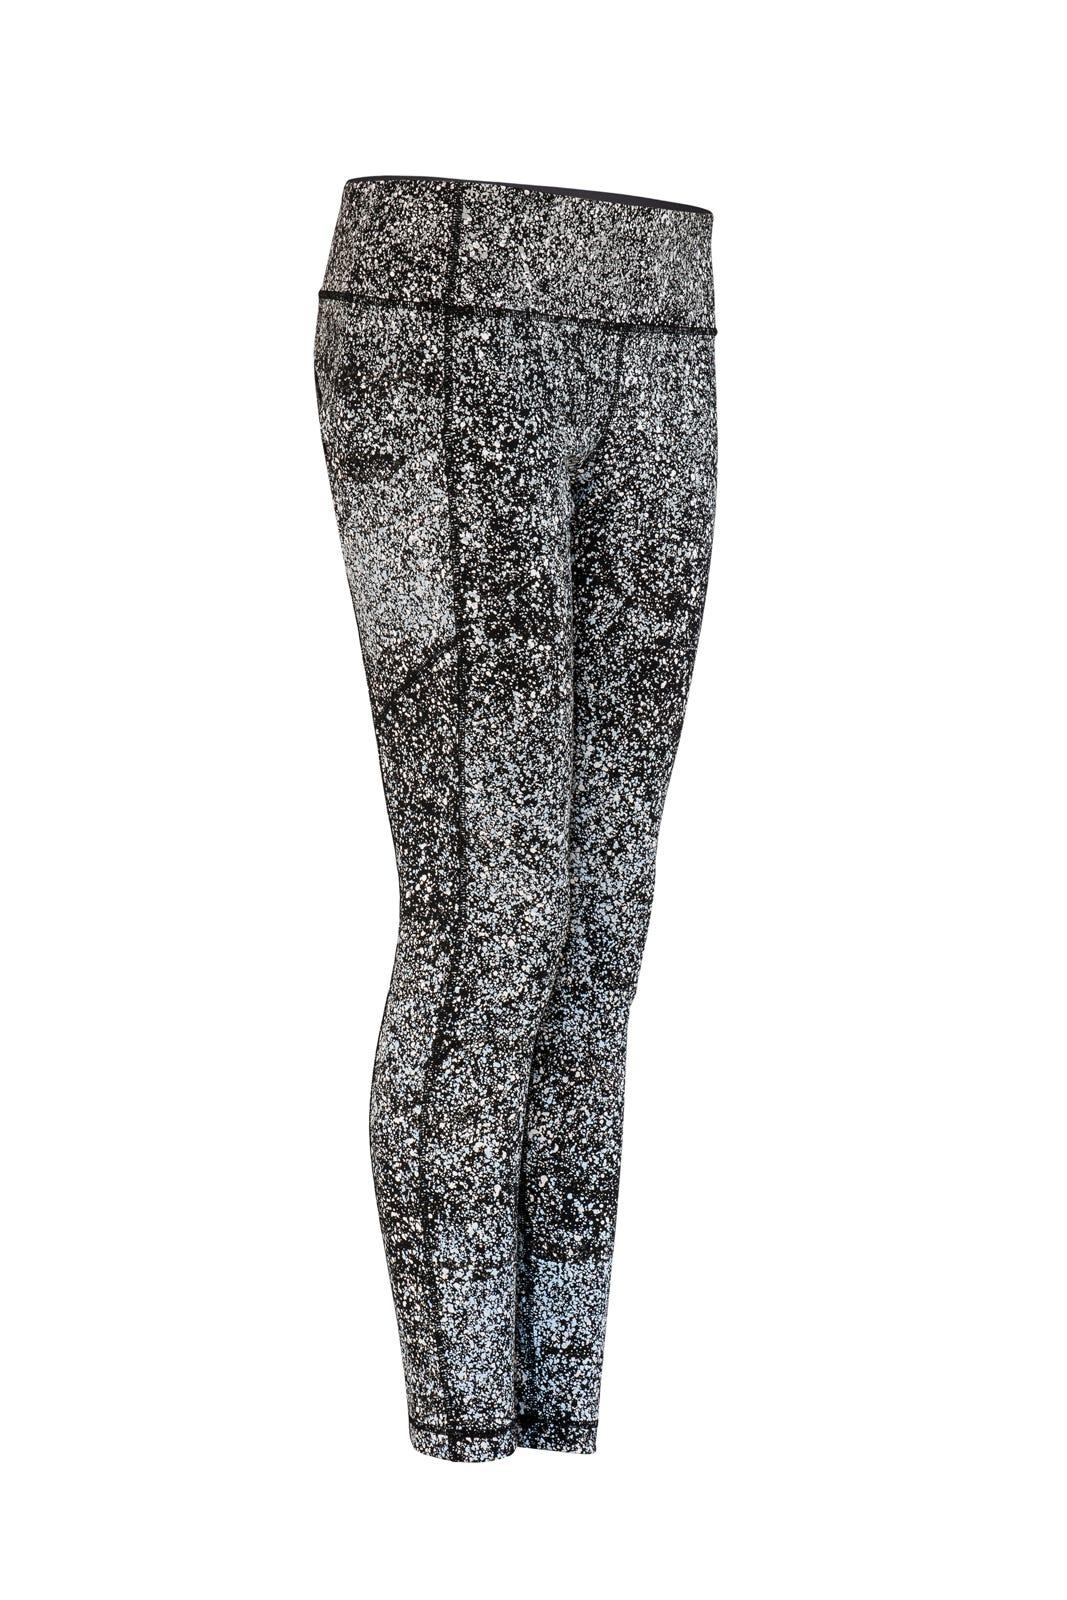 22566e9a3 Lululemon Reflective Splatter Leggings Workout Clothes